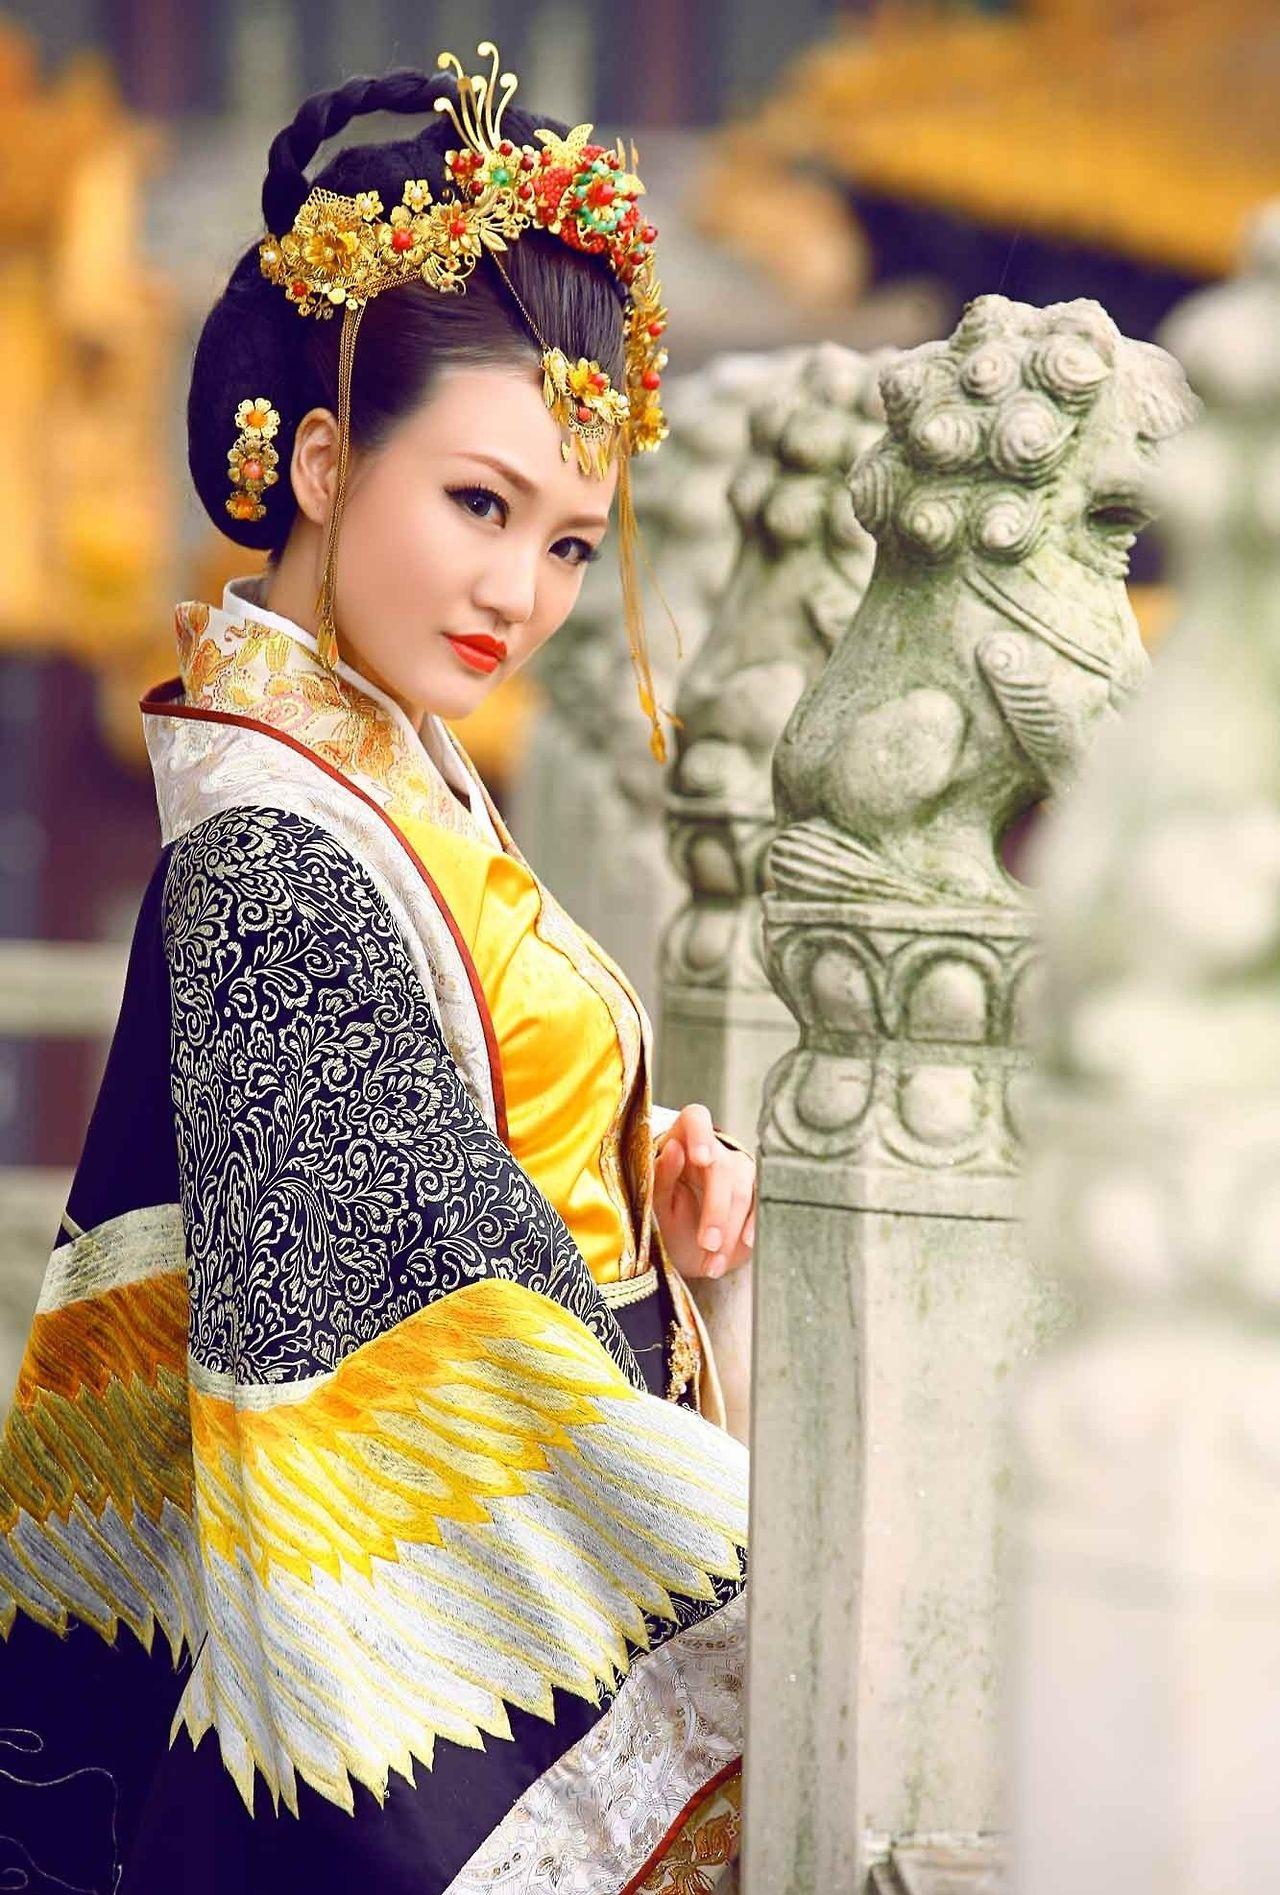 mingsonjia: 唐风汉服 Tang Dynasty Style Hanfu | Clothing Oriental ...